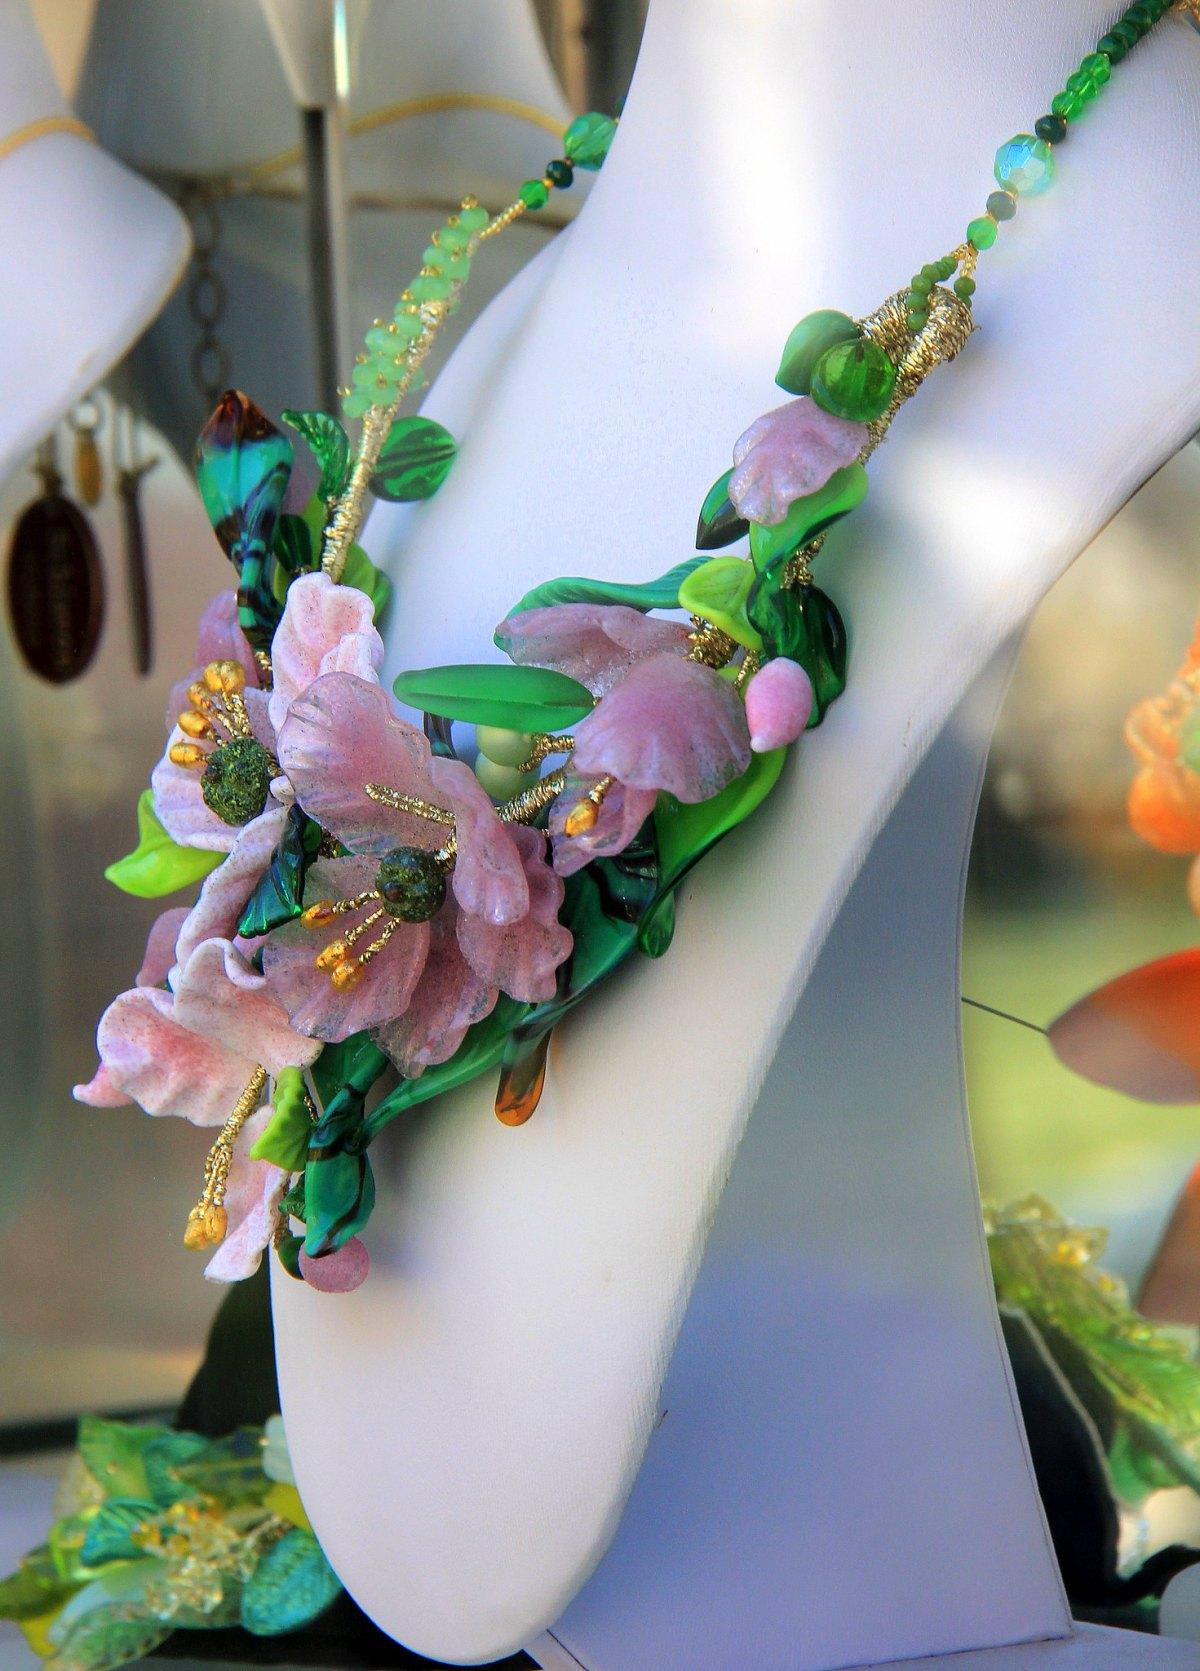 Murano produces world class glass ware